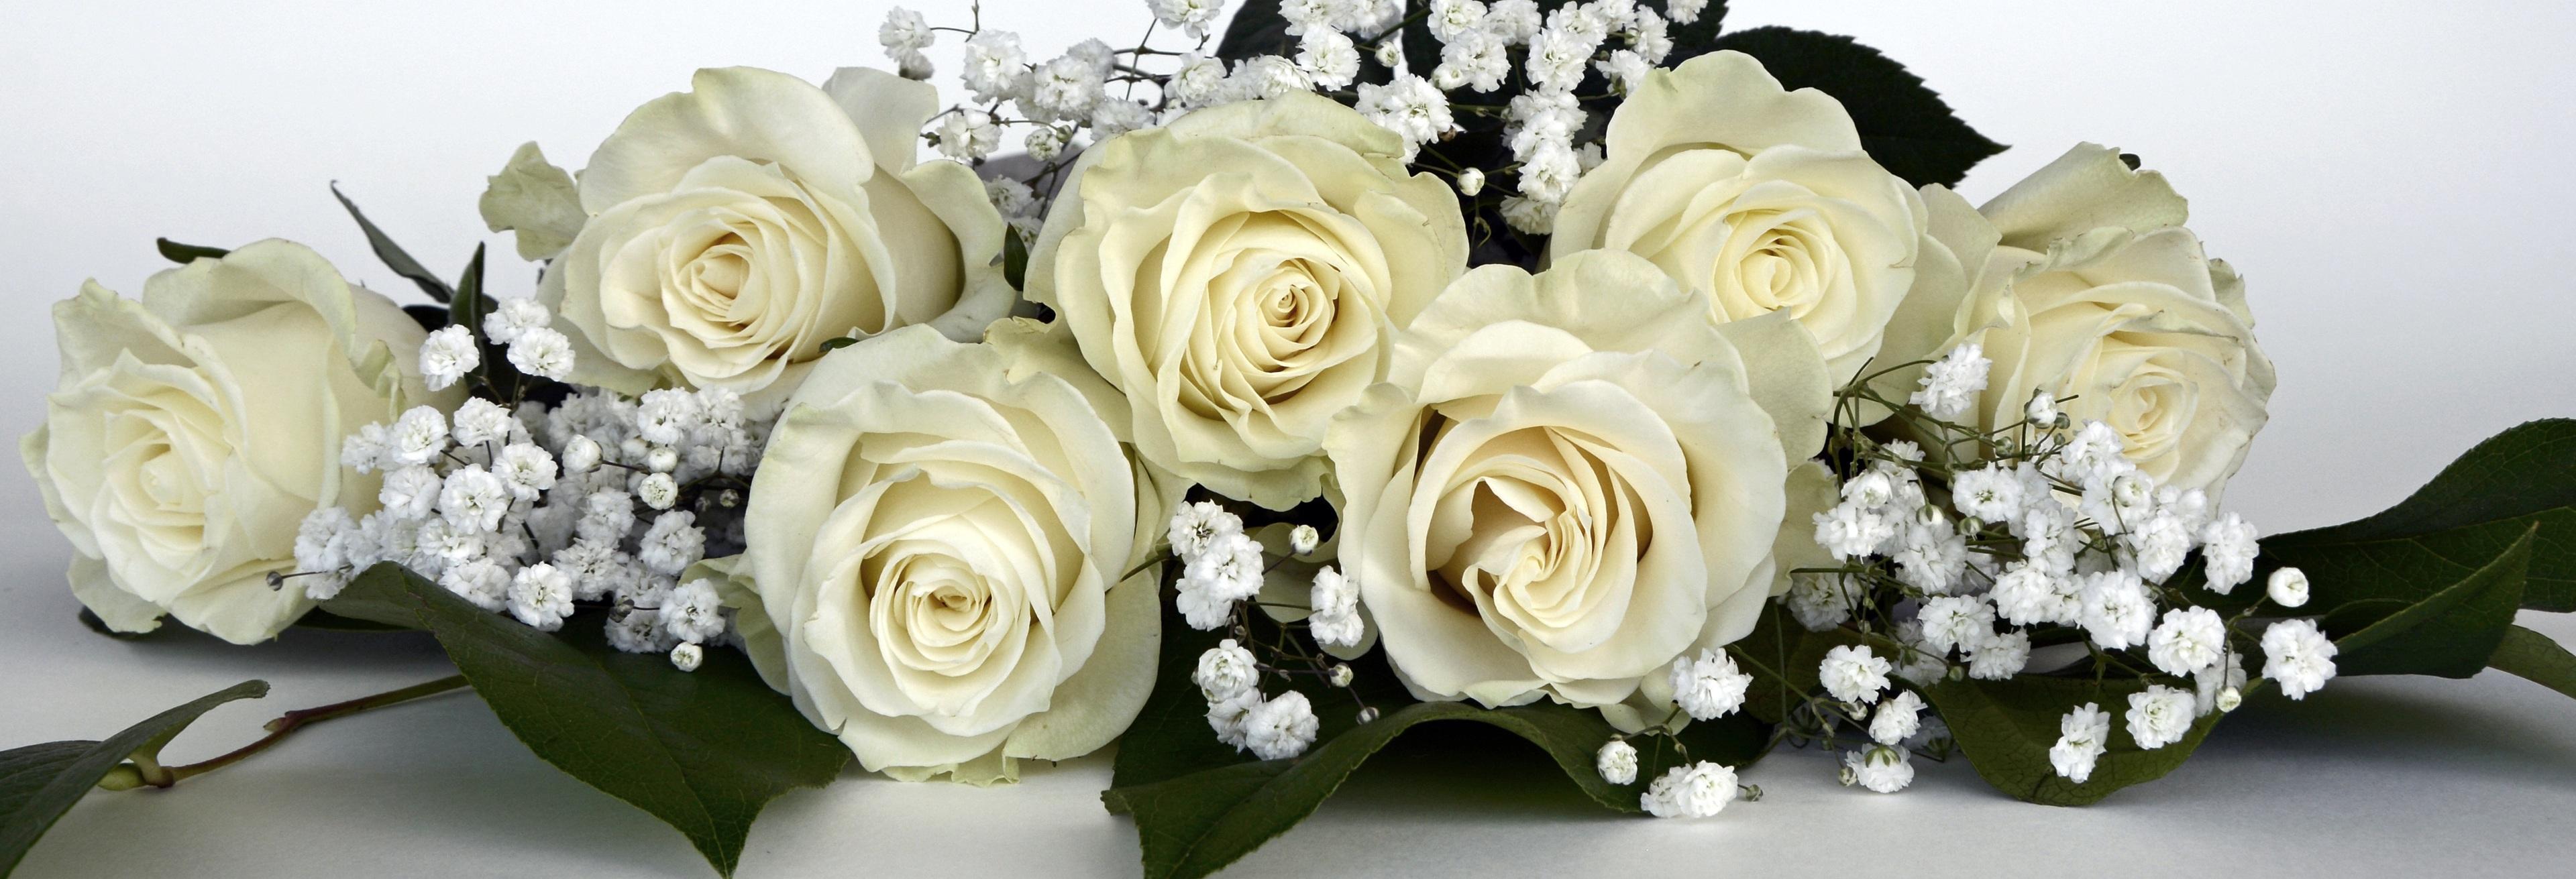 Free Images Nature White Petal Love Banner Romance Wedding